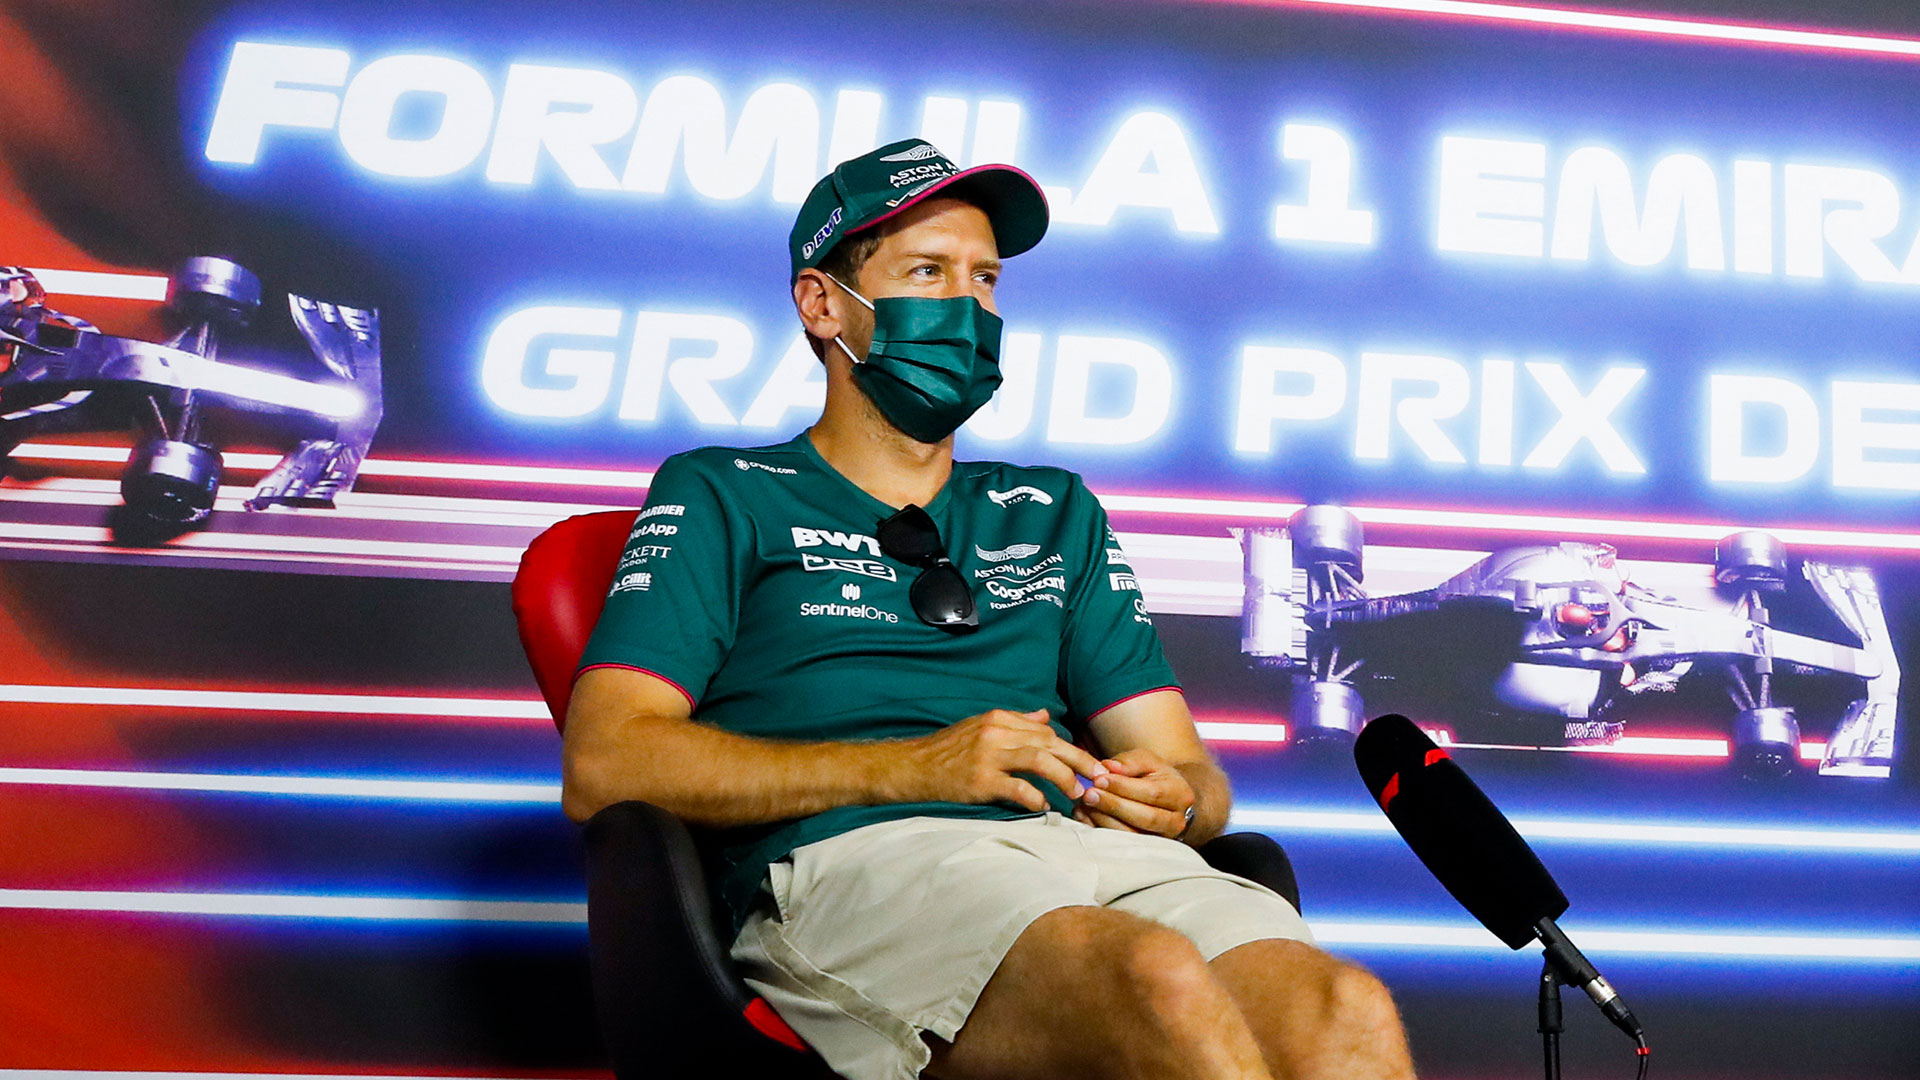 Sebastian Vettel snelheidlimiet autobahn